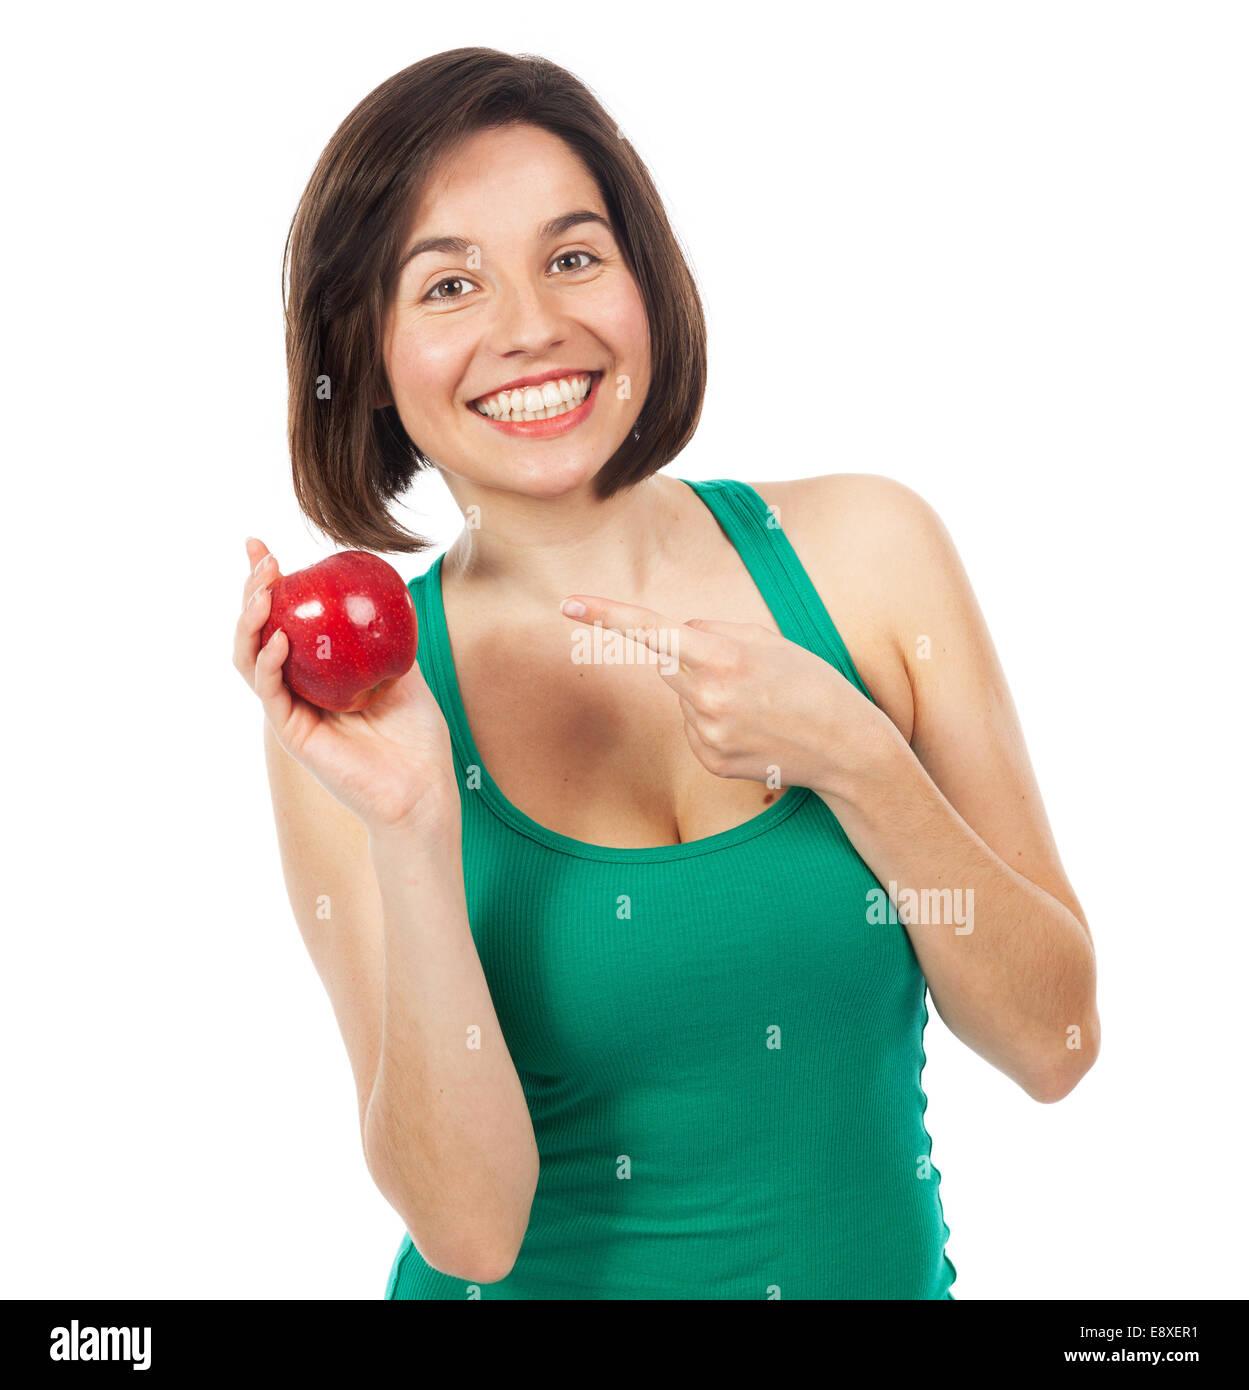 Belle Jeune femme tenant et montrant une pomme rouge, isolated on white Photo Stock